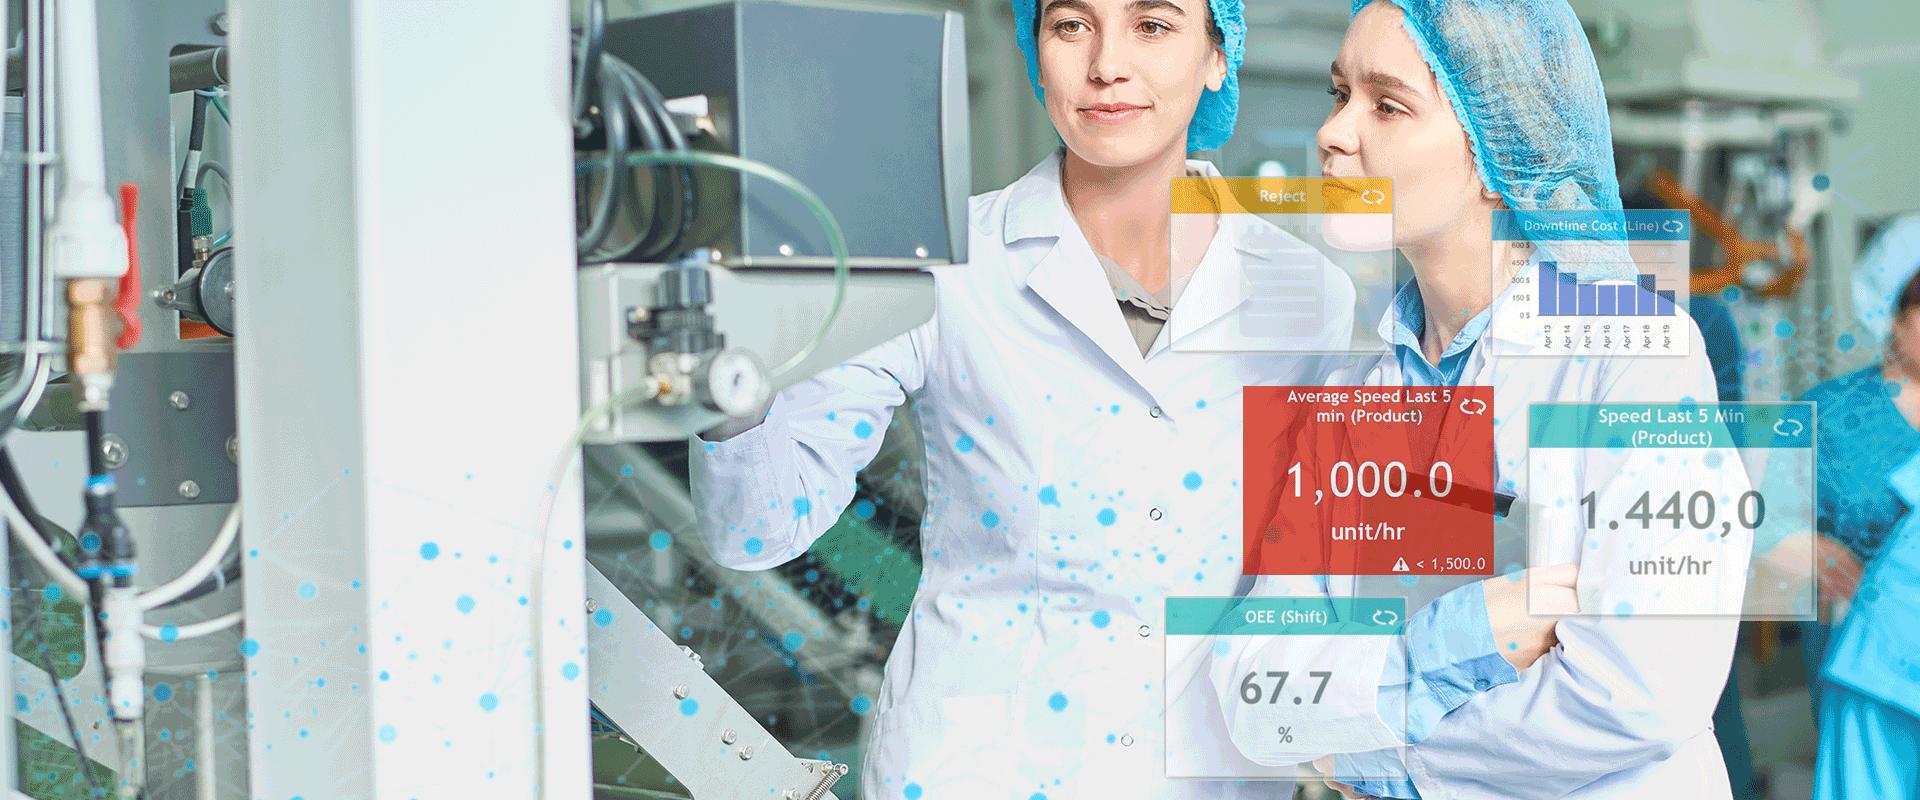 Header_Worximity_Food_Bev_Monitoring_Software_2_workers